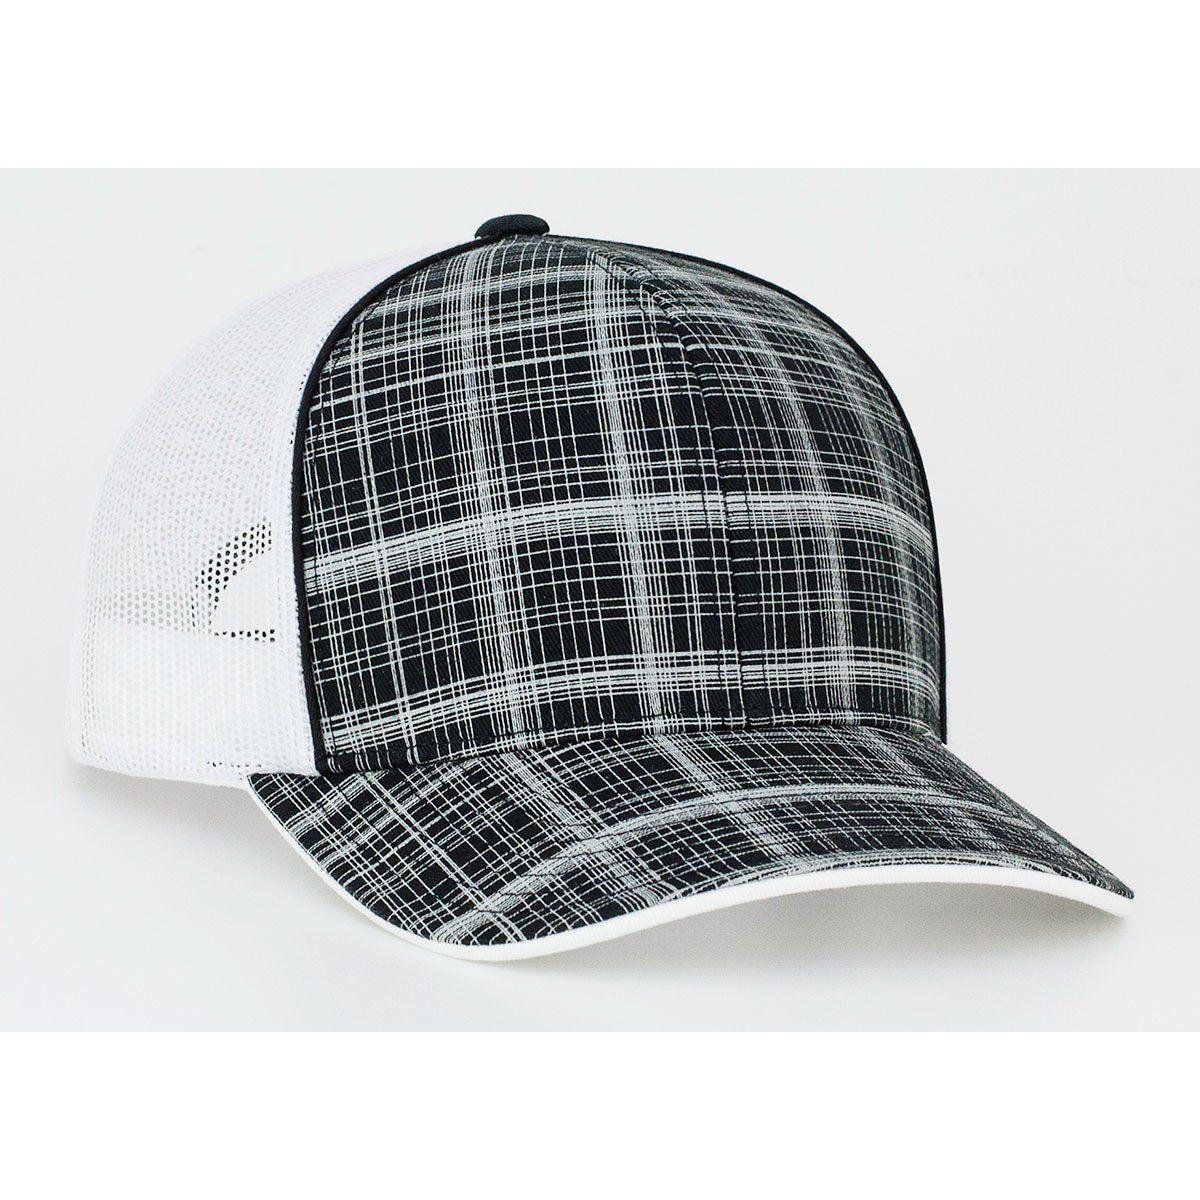 Pacific Headwear Black White Crosshatch Snapback Trucker Mesh Cap ... b7374b2ba187